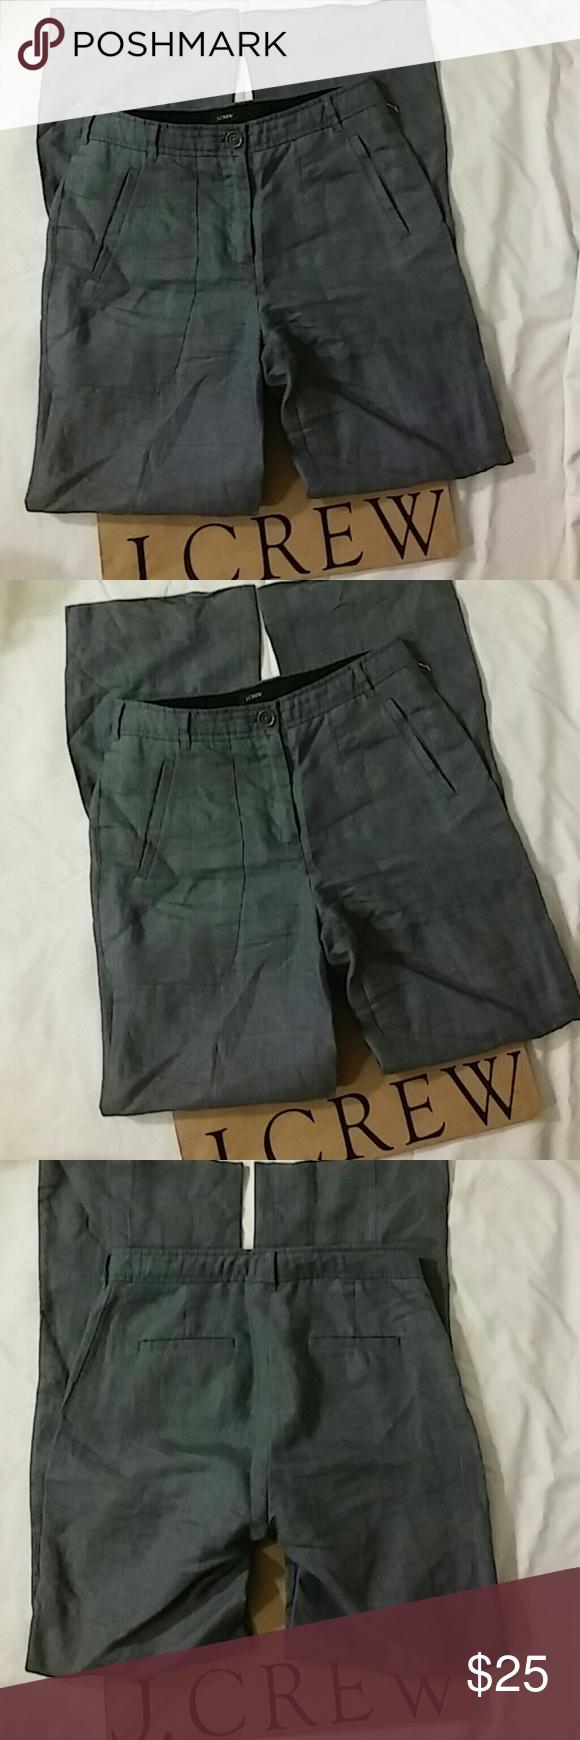 J Crew Linen Pants Size 2 Waist 14.5in. Inseam 33in. Length 42.5in 100% Linen J. Crew Pants Trousers